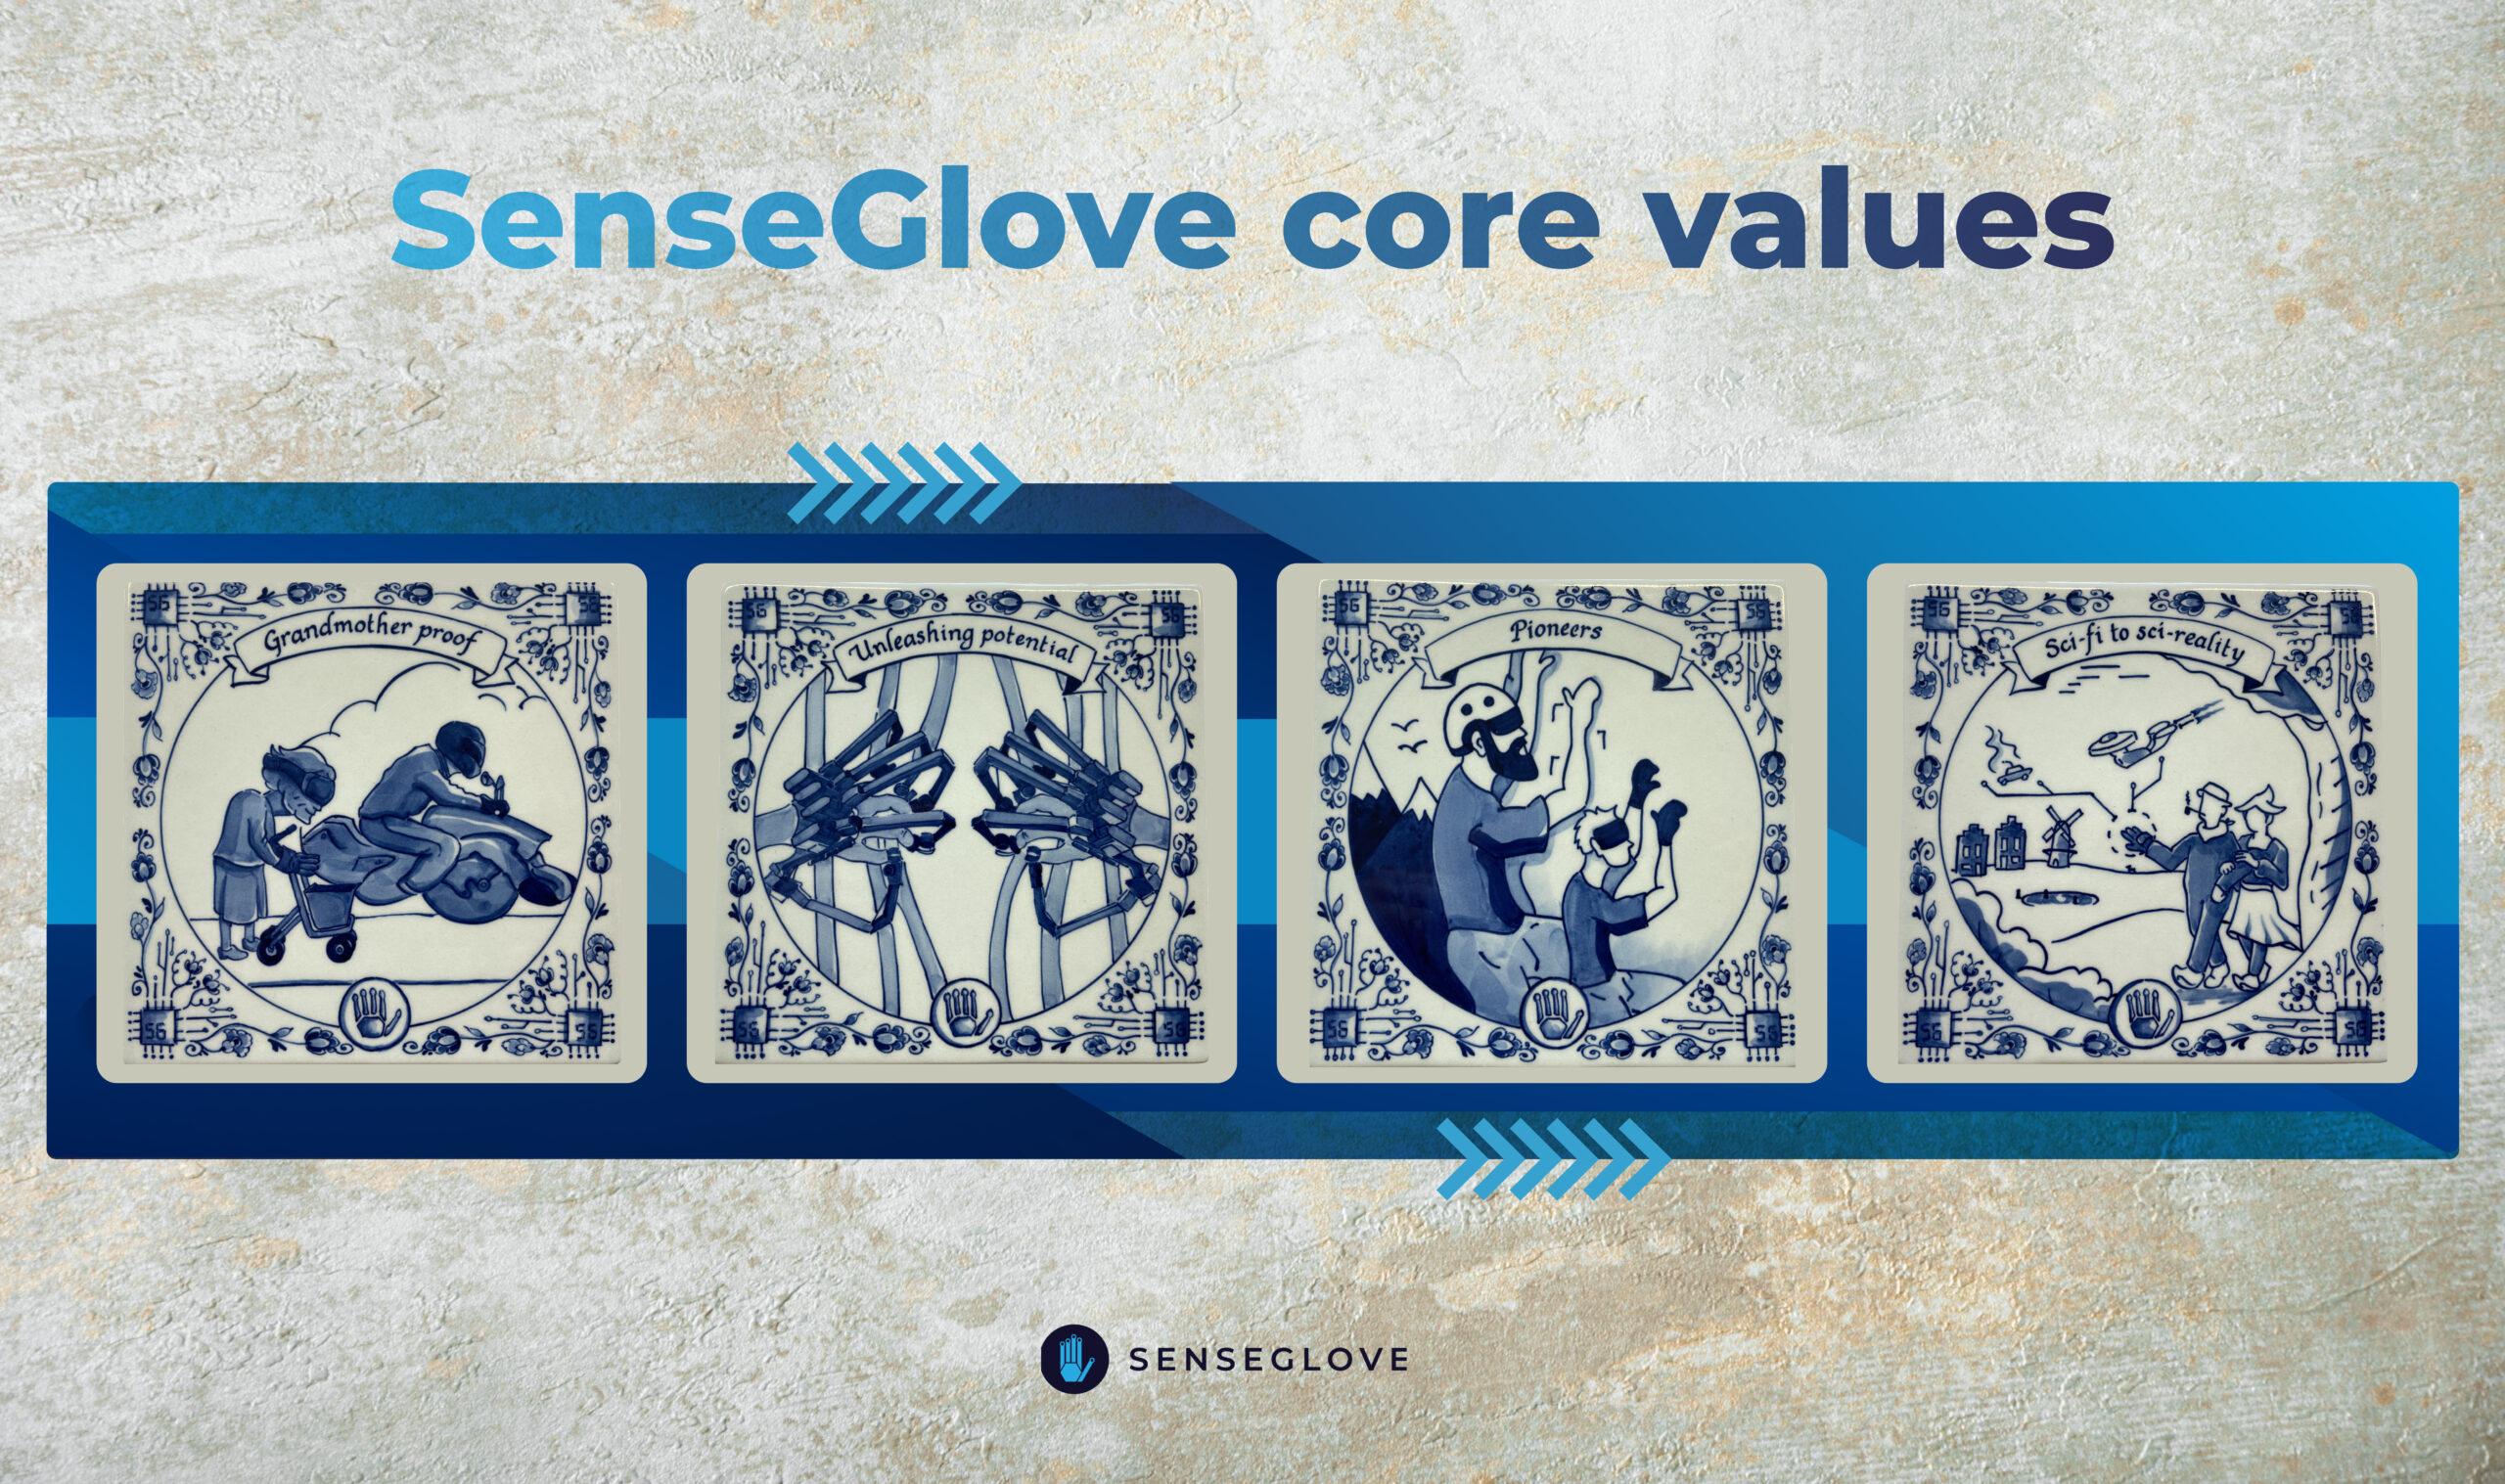 SenseGlove values